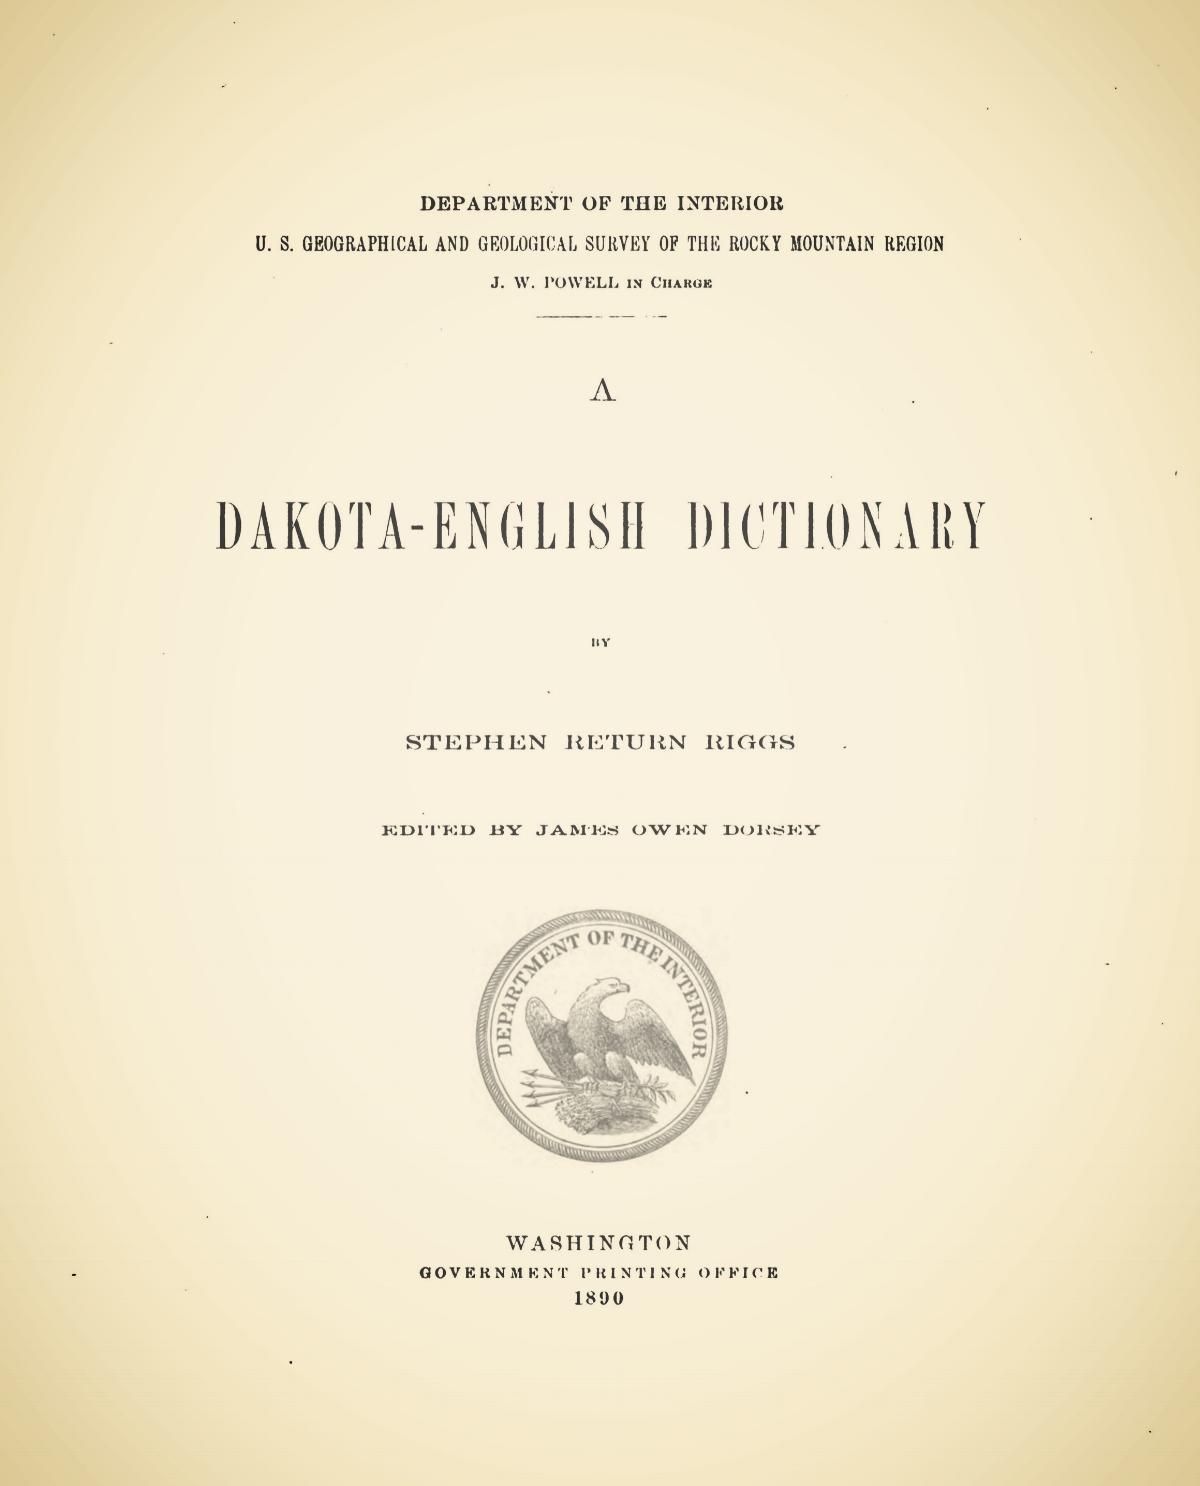 Riggs, Stephen Return, A Dakota-English Dictionary Title Page.jpg